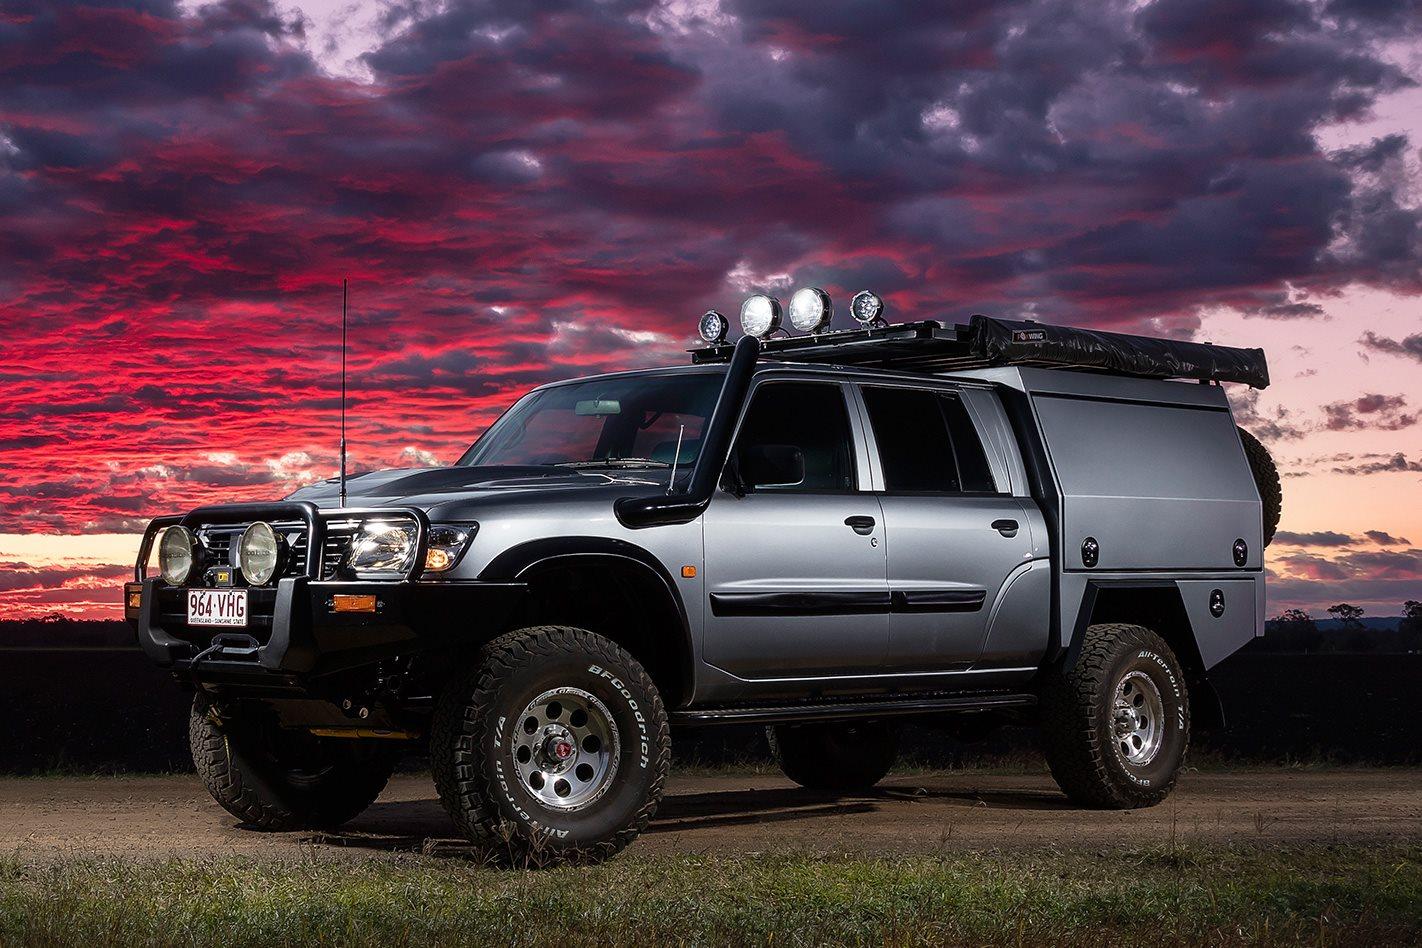 rv creations dual cab nissan gu patrol custom 4x4 4x4 australia. Black Bedroom Furniture Sets. Home Design Ideas